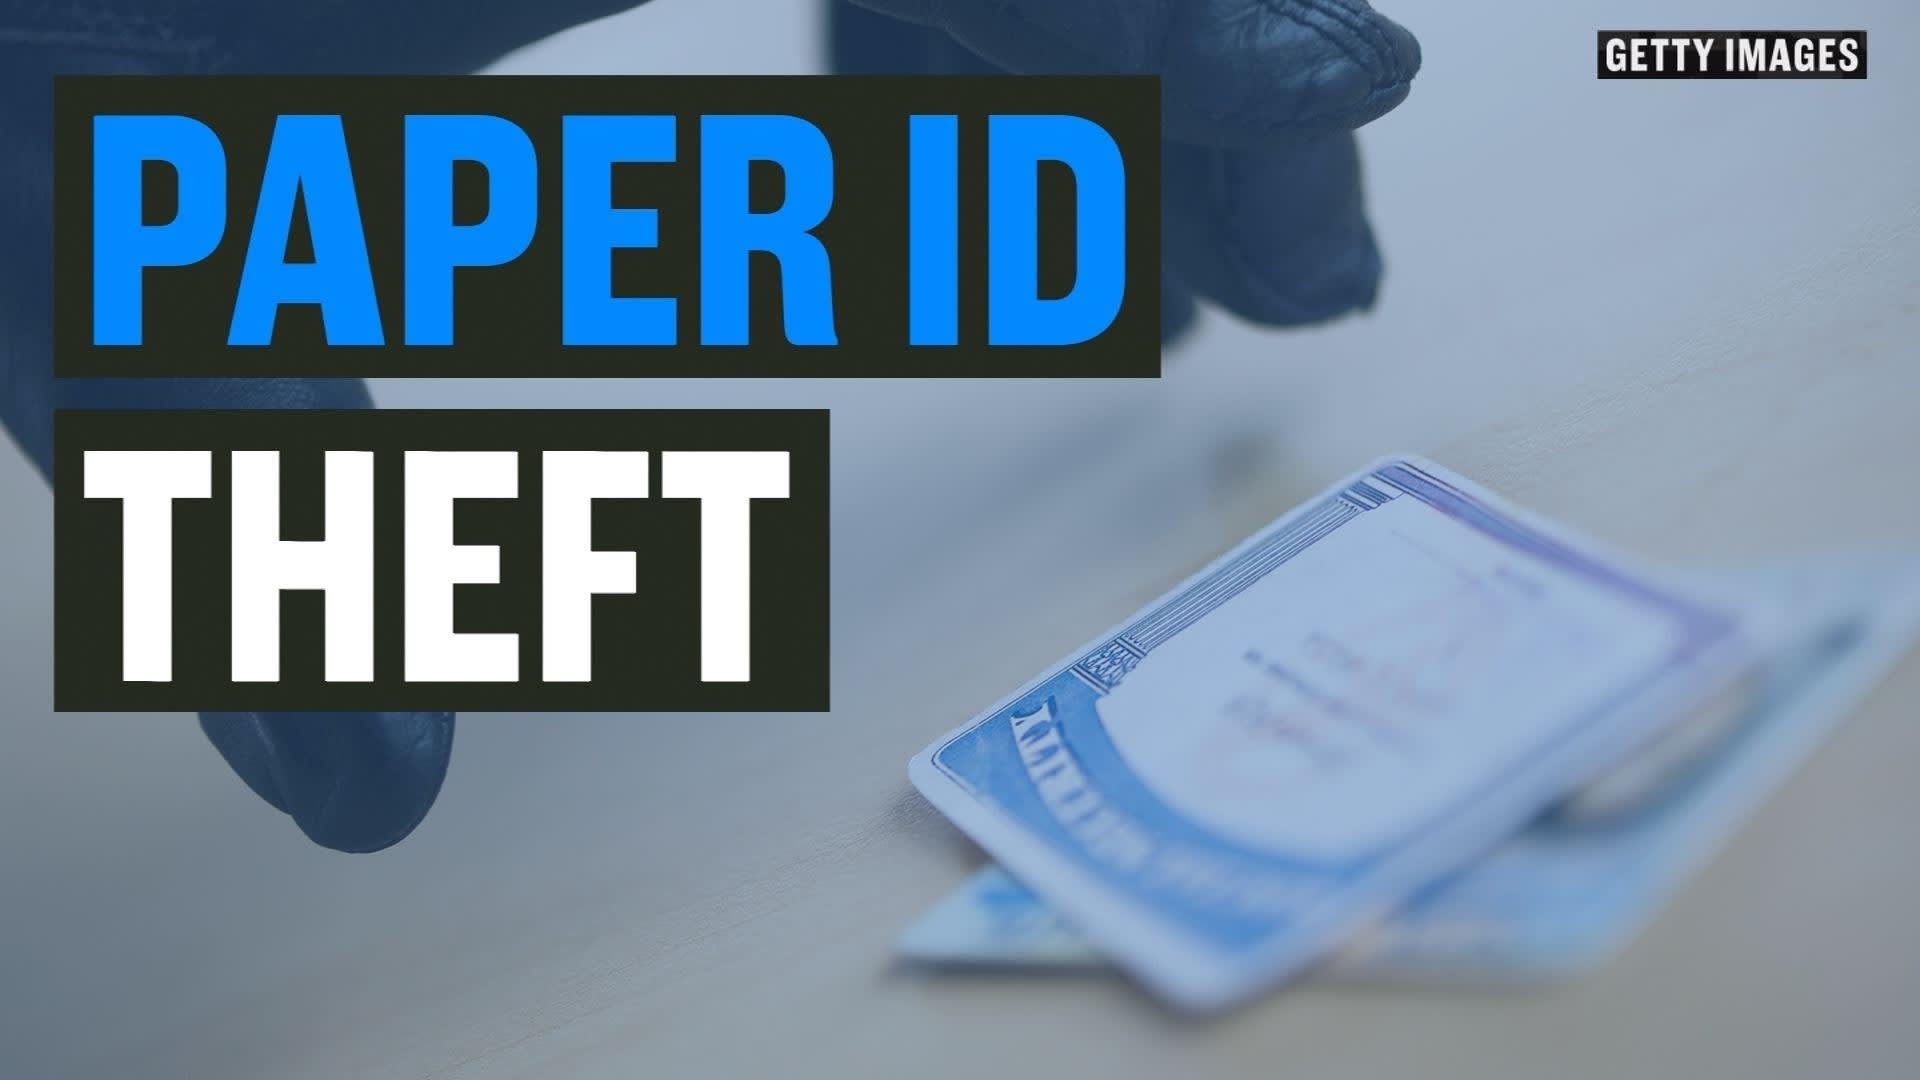 Managing analog ID theft risks